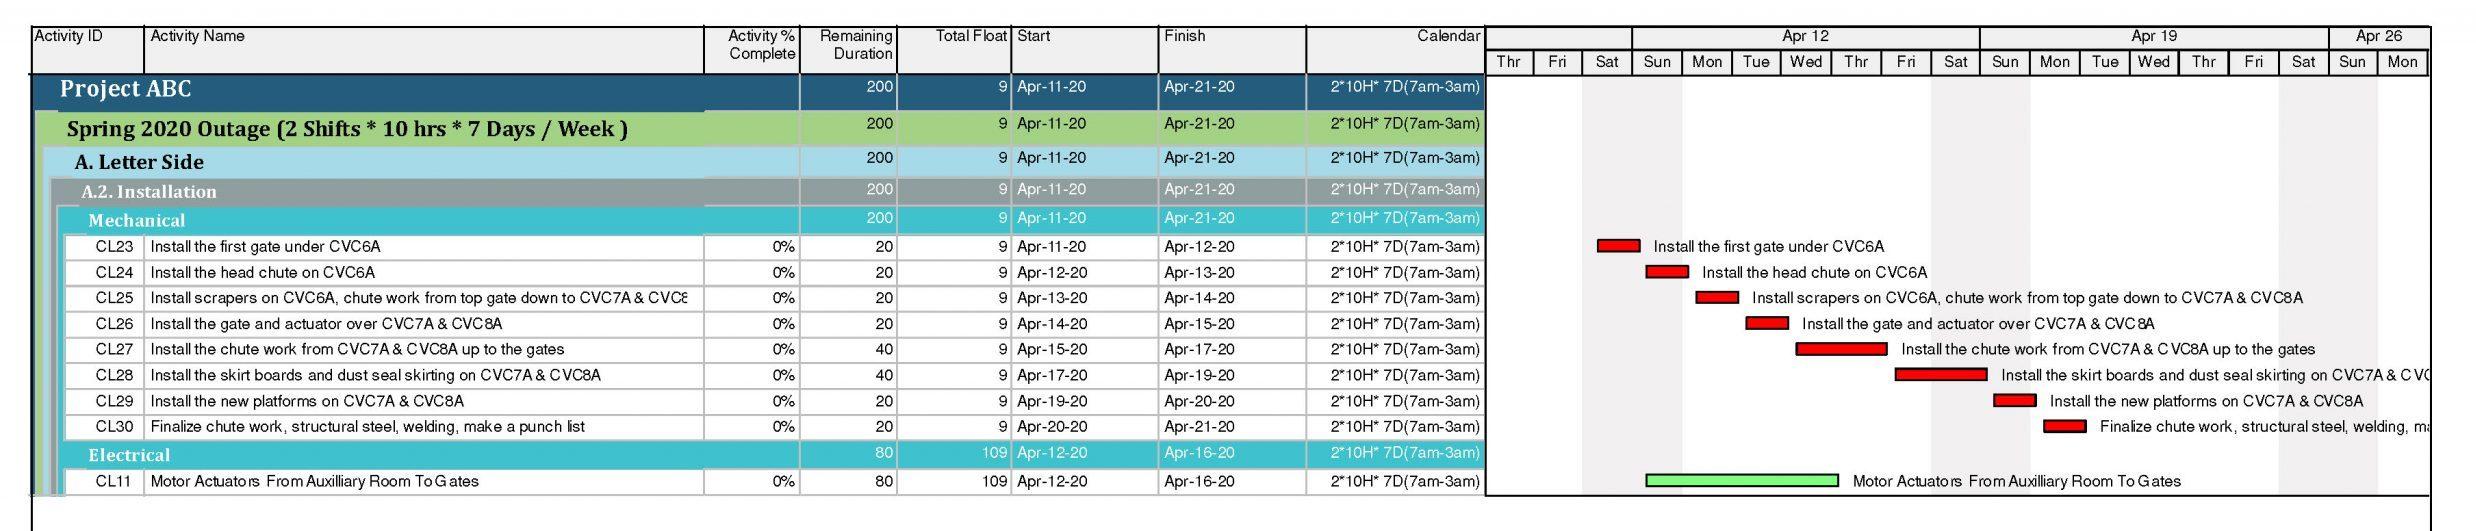 10 Days lookahead schedule sample